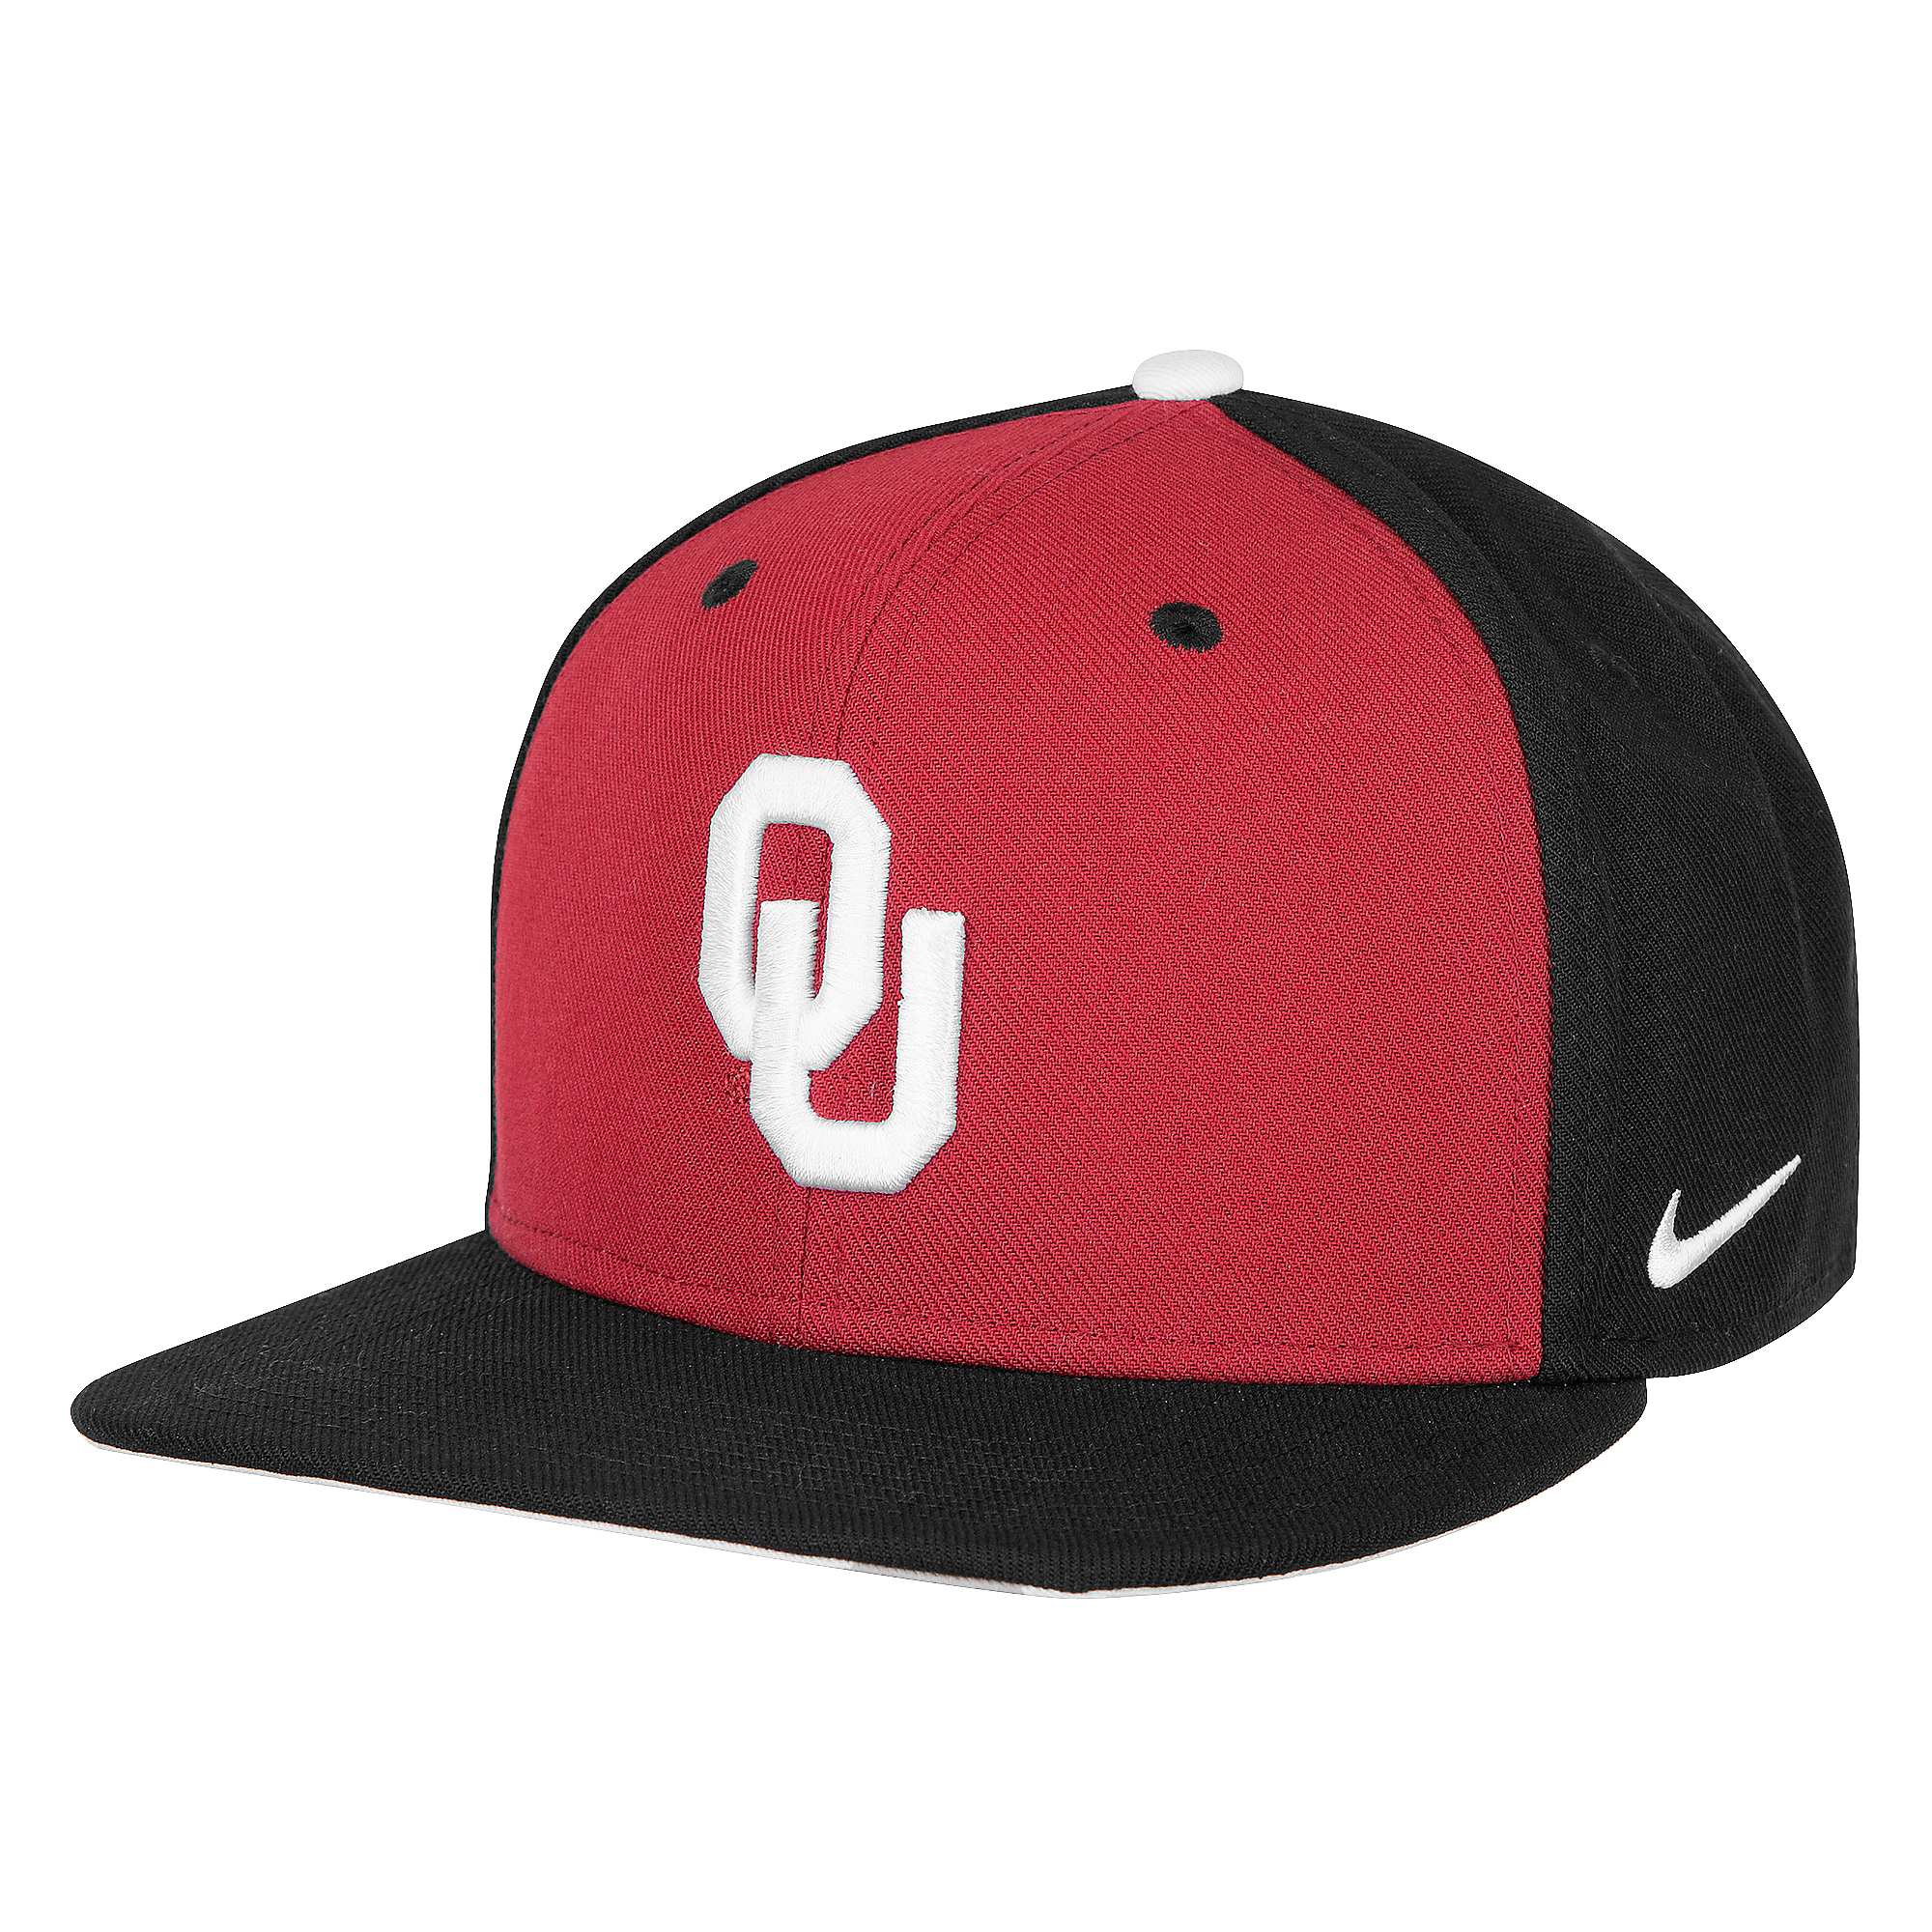 Oklahoma Sooners Nike Pro Verbiage Adjustable Cap  a0ebccd9287